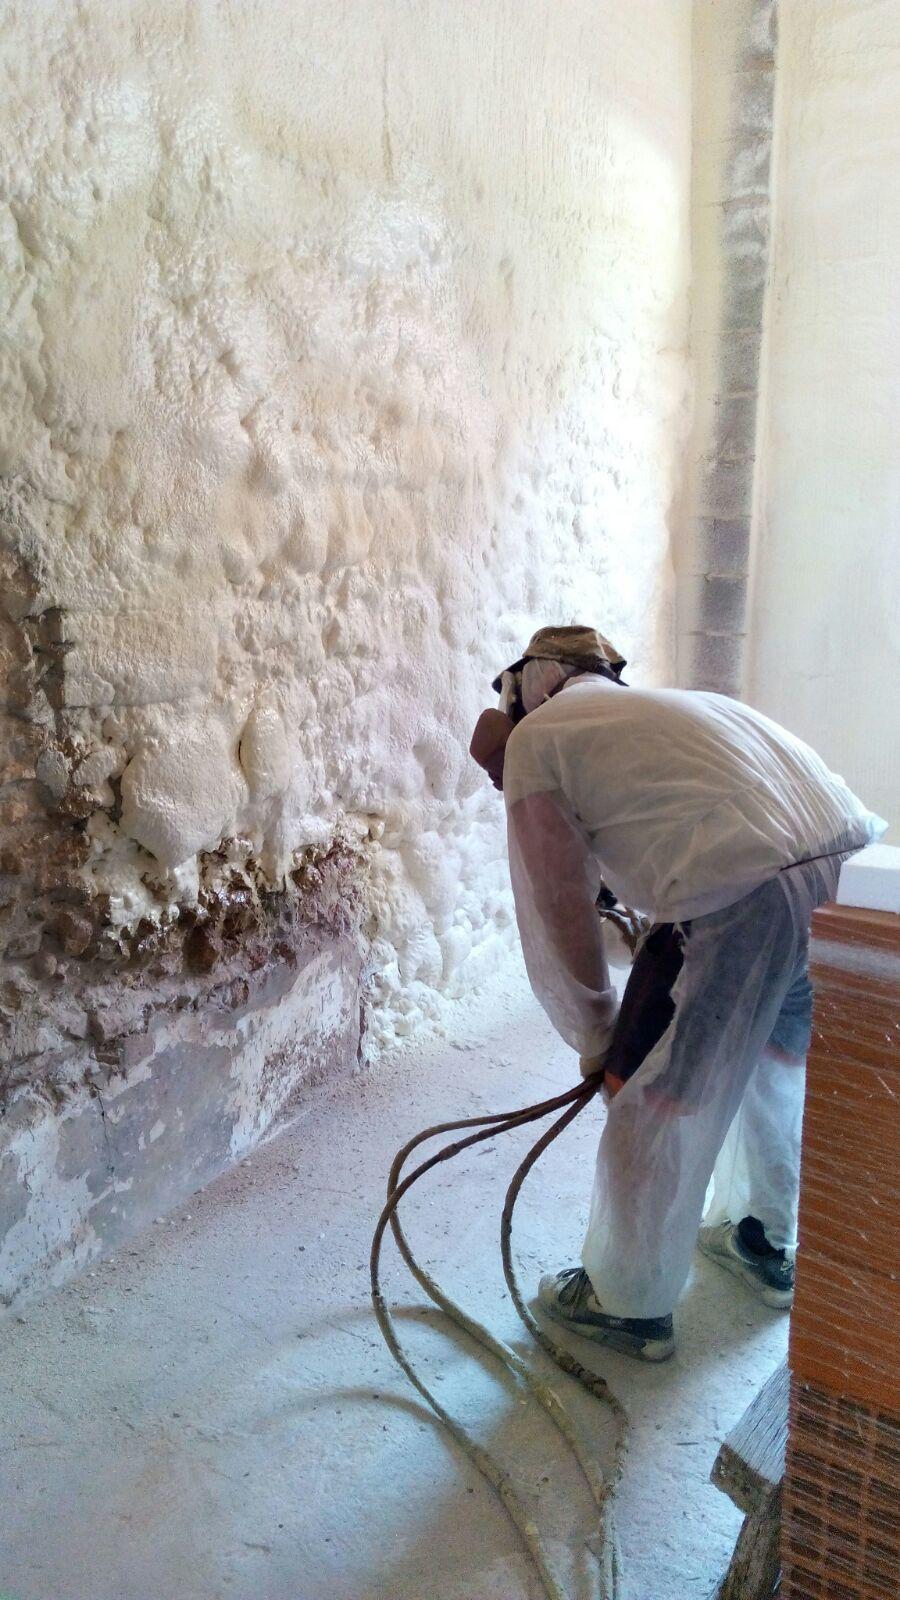 Foto 49 de Aislamientos acústicos y térmicos en Rafelcofer | Aislamientos de Poliuretano Jaime Femenia